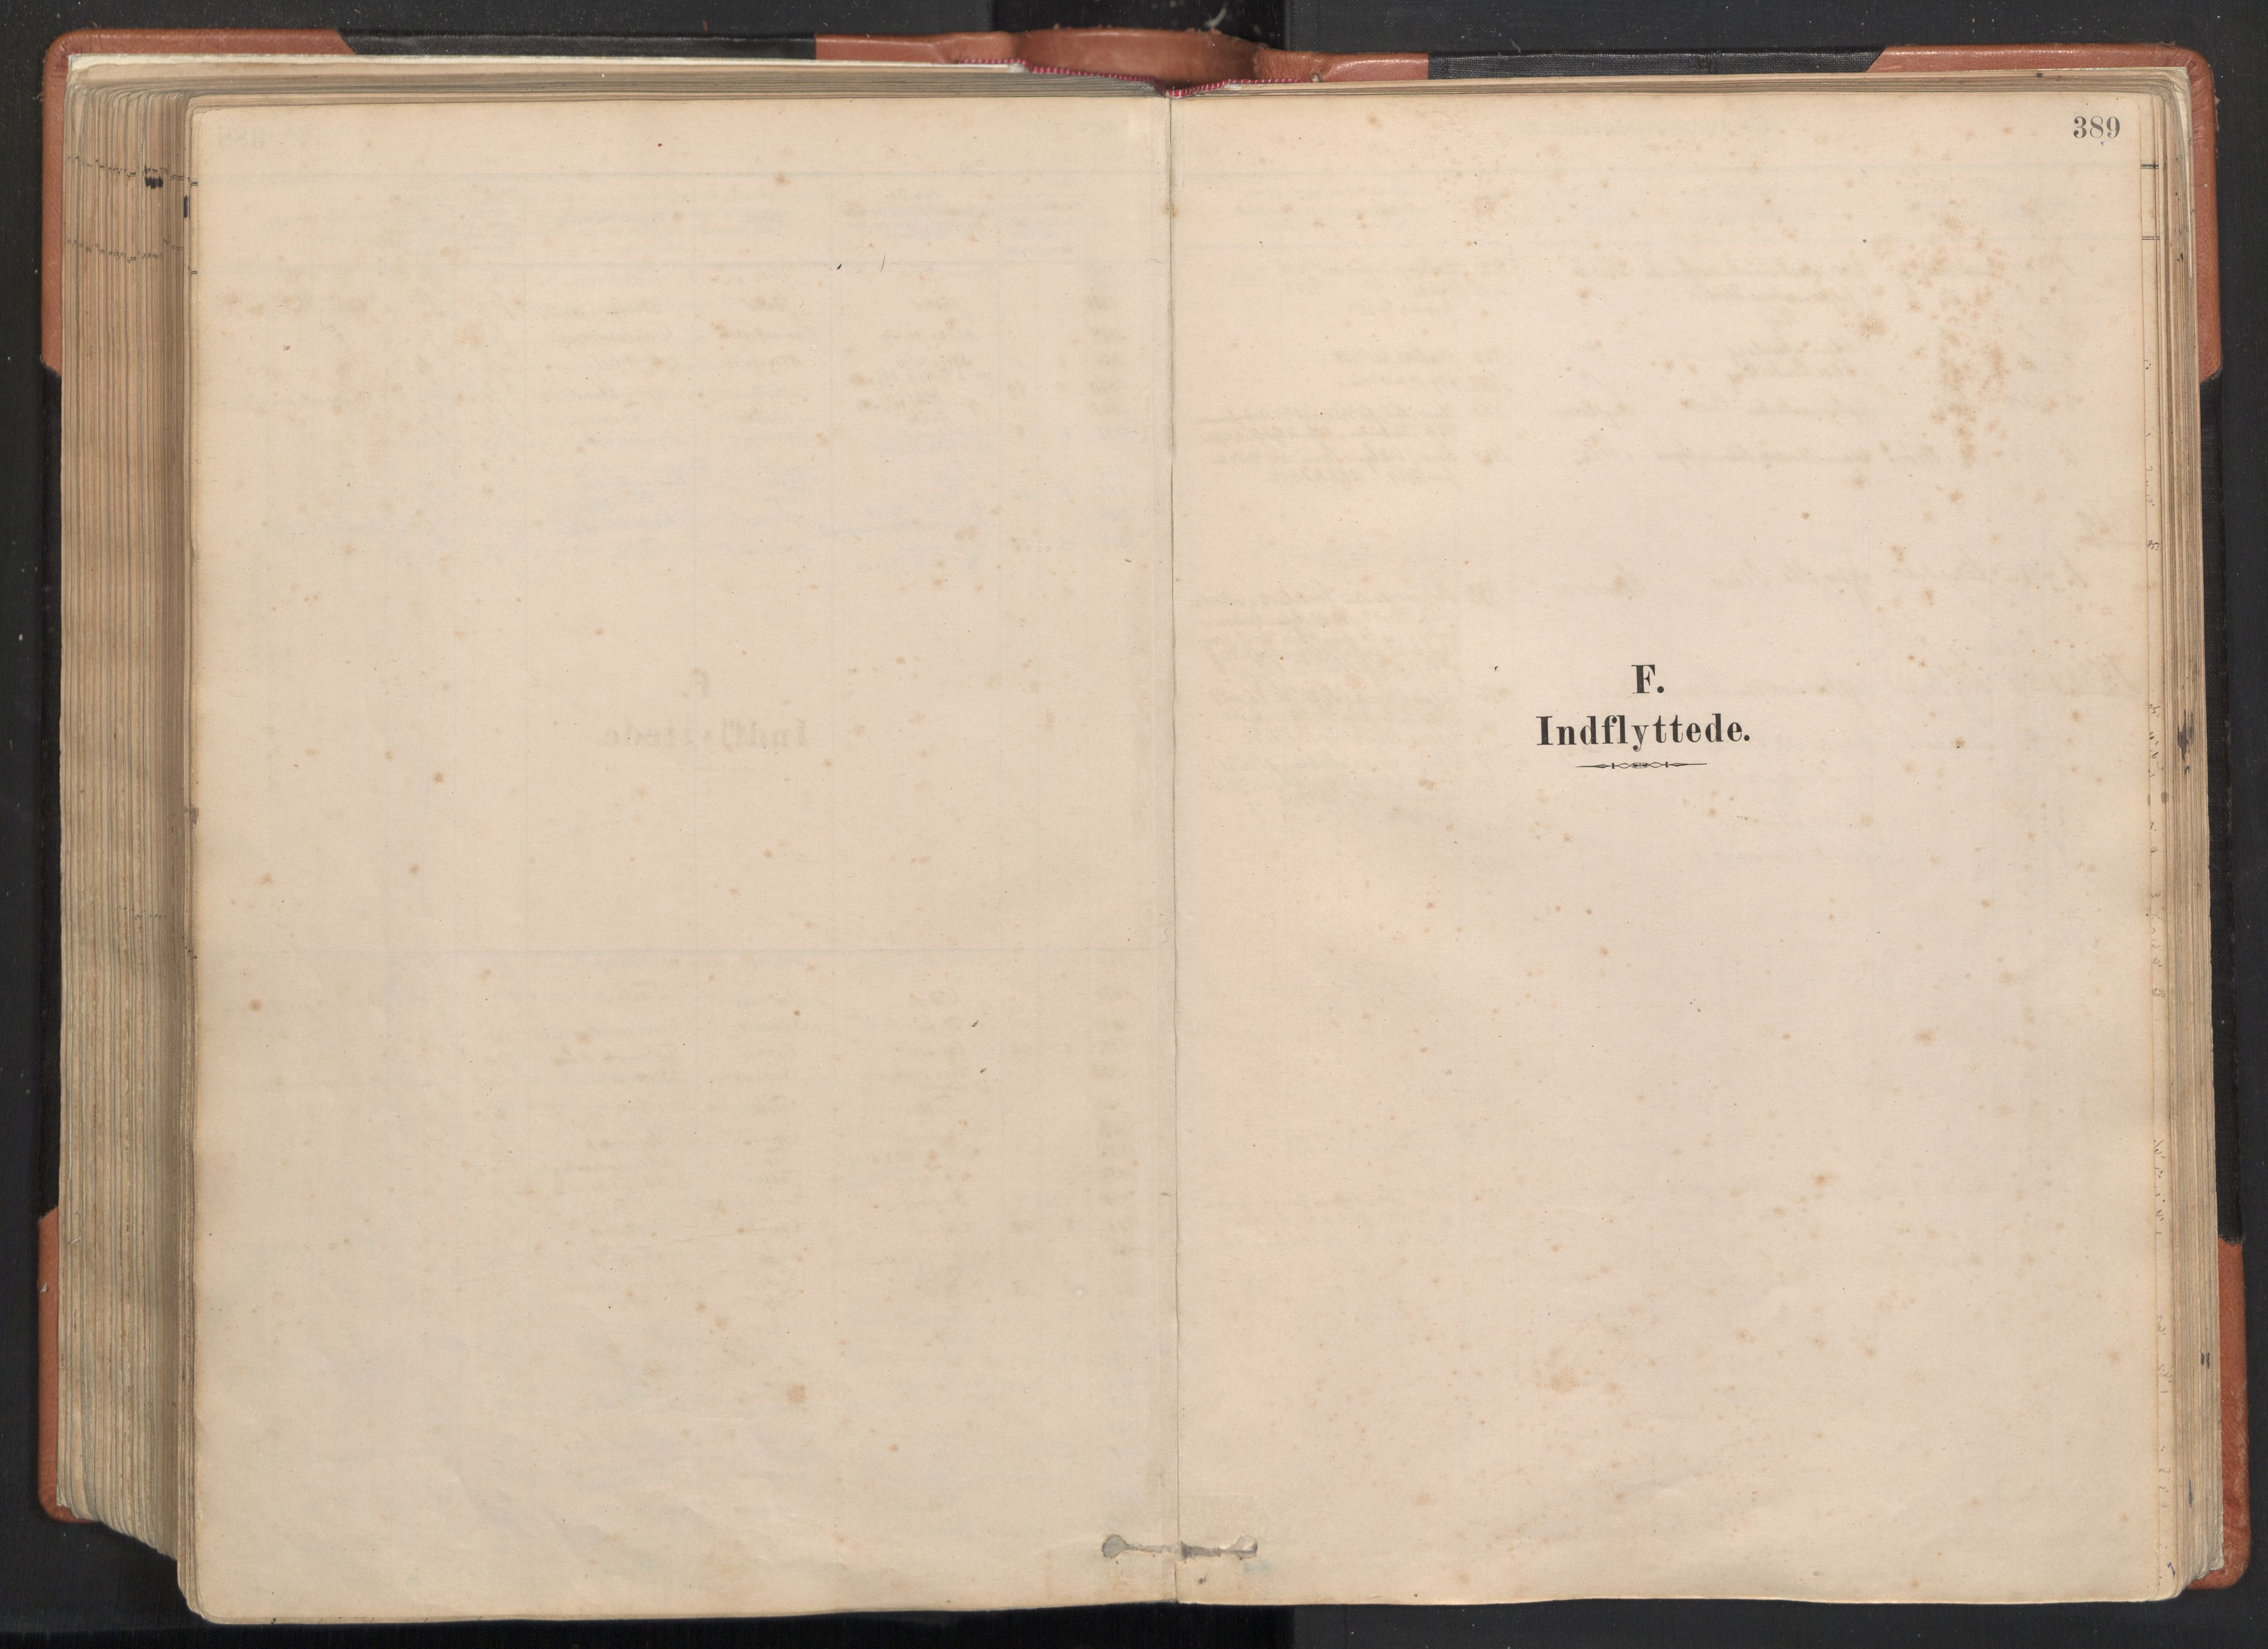 SAT, Ministerialprotokoller, klokkerbøker og fødselsregistre - Nordland, 817/L0264: Ministerialbok nr. 817A04, 1878-1907, s. 389